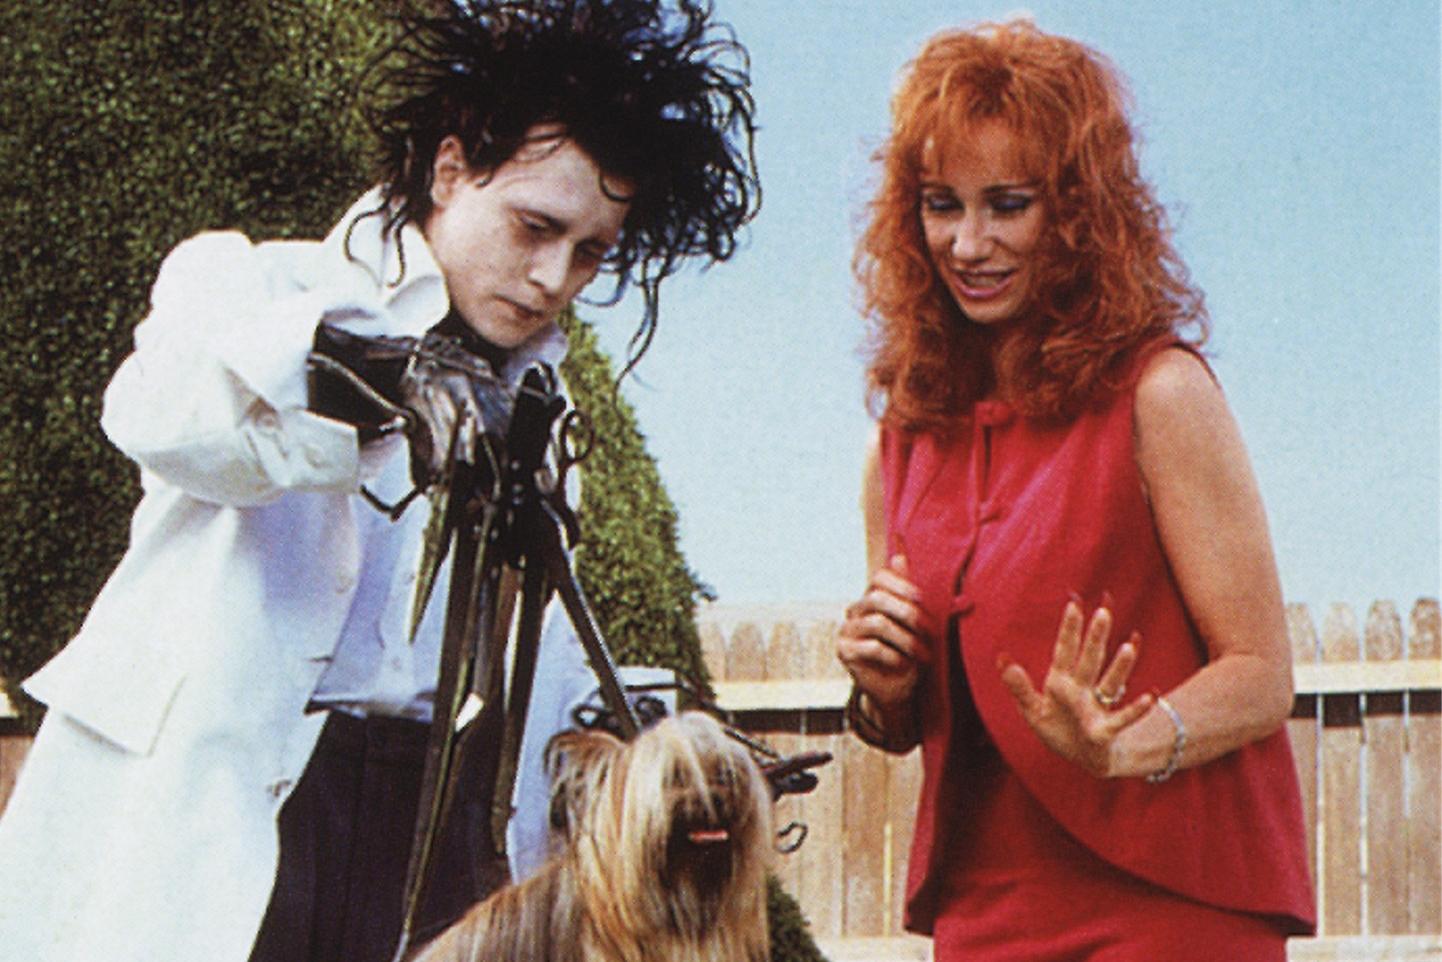 Movie: Edward Scissorhands, 1990; Play: Edward Scissorhands, 2005.